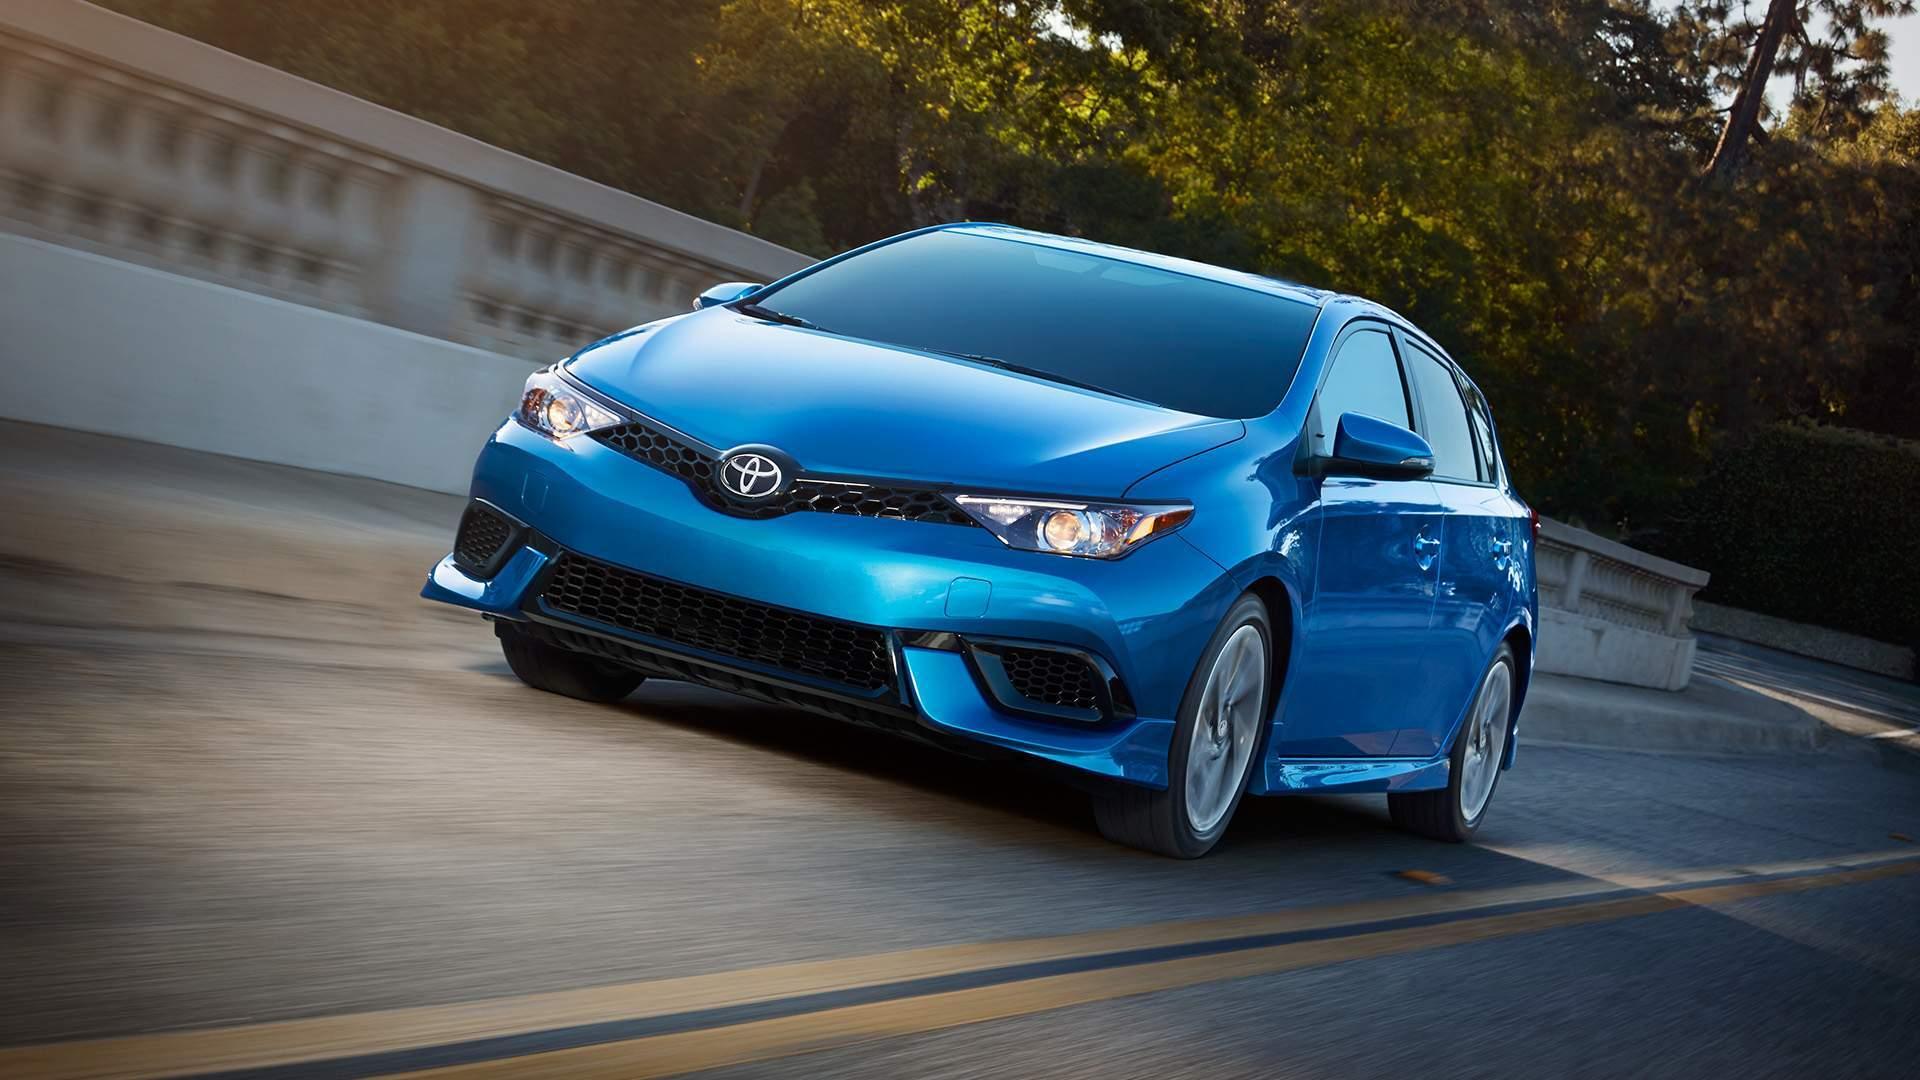 Toyota Corolla Owners Manual: Eco Driving Indicator Light customization